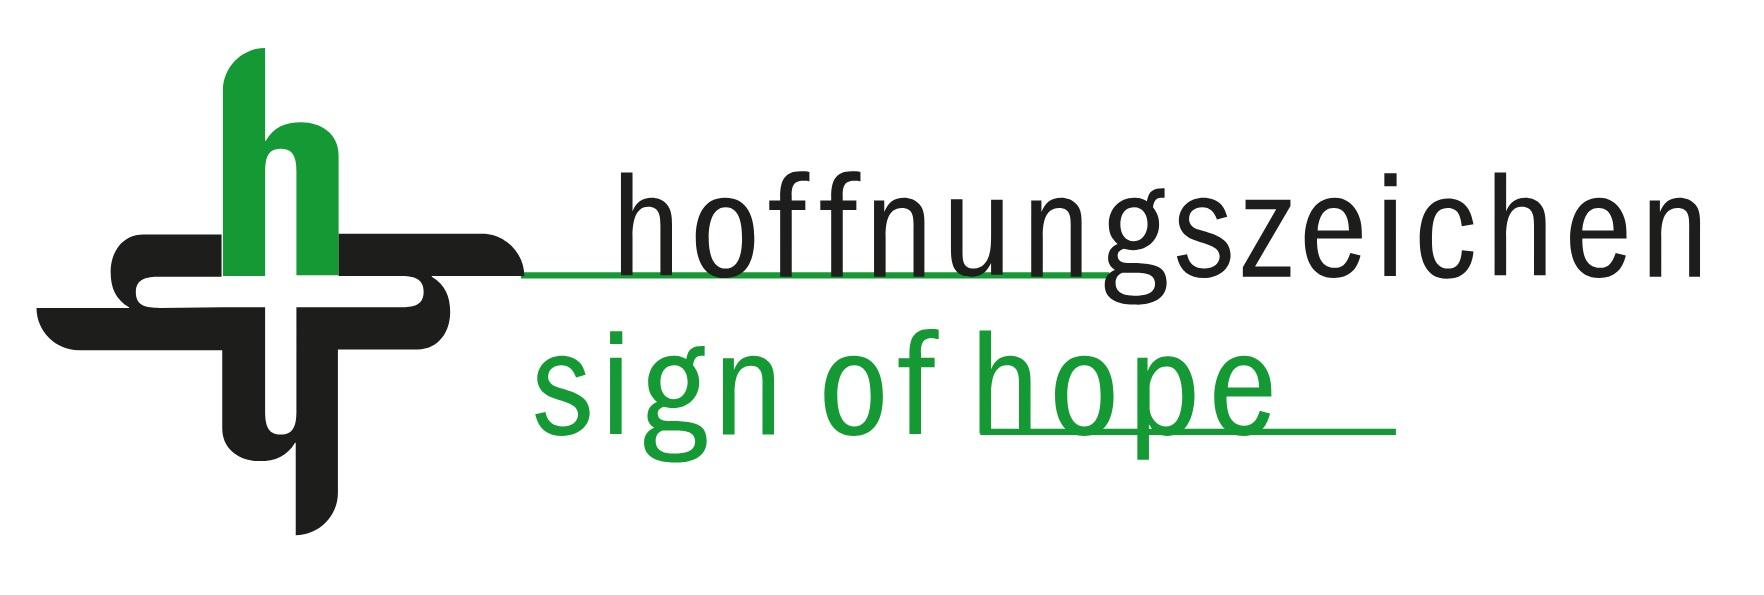 signofhope-logo